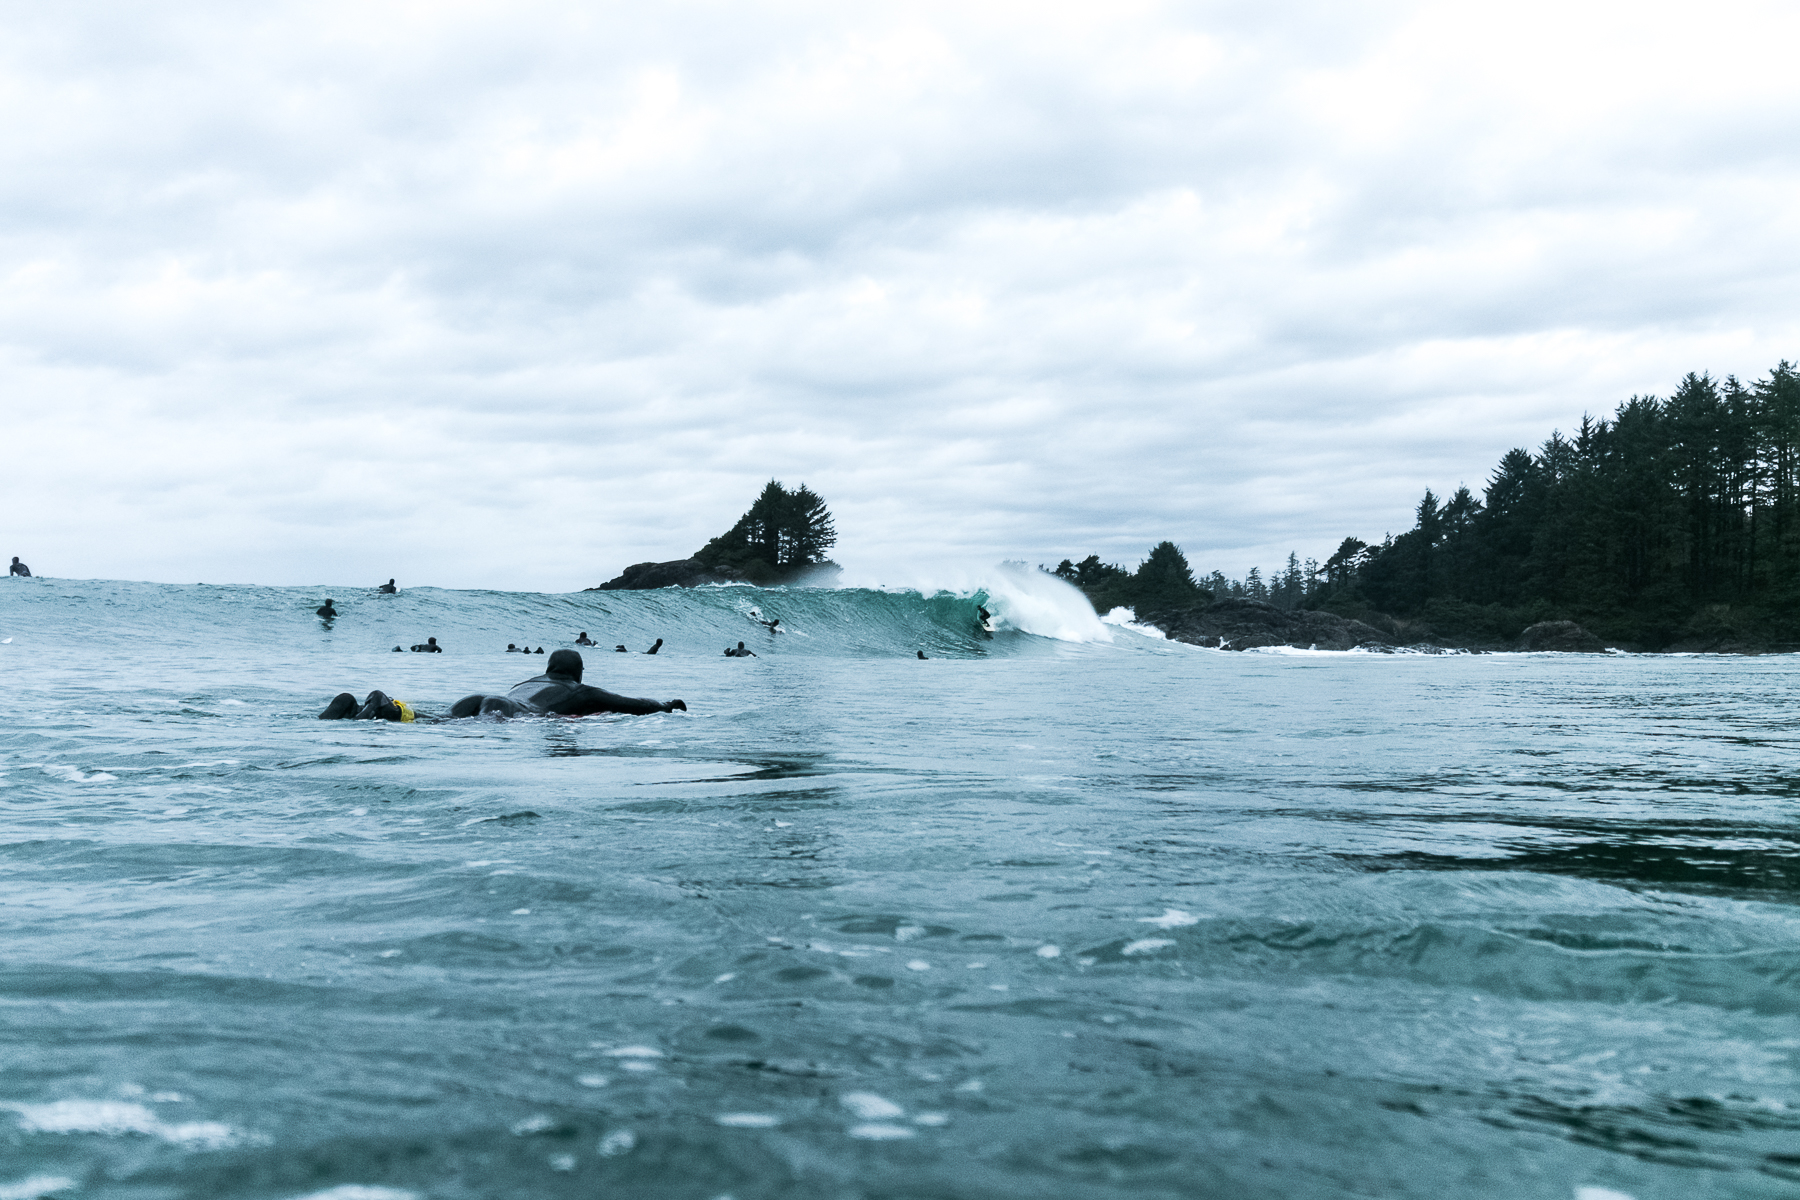 tofino_surf_photography-canadafornia.jpg